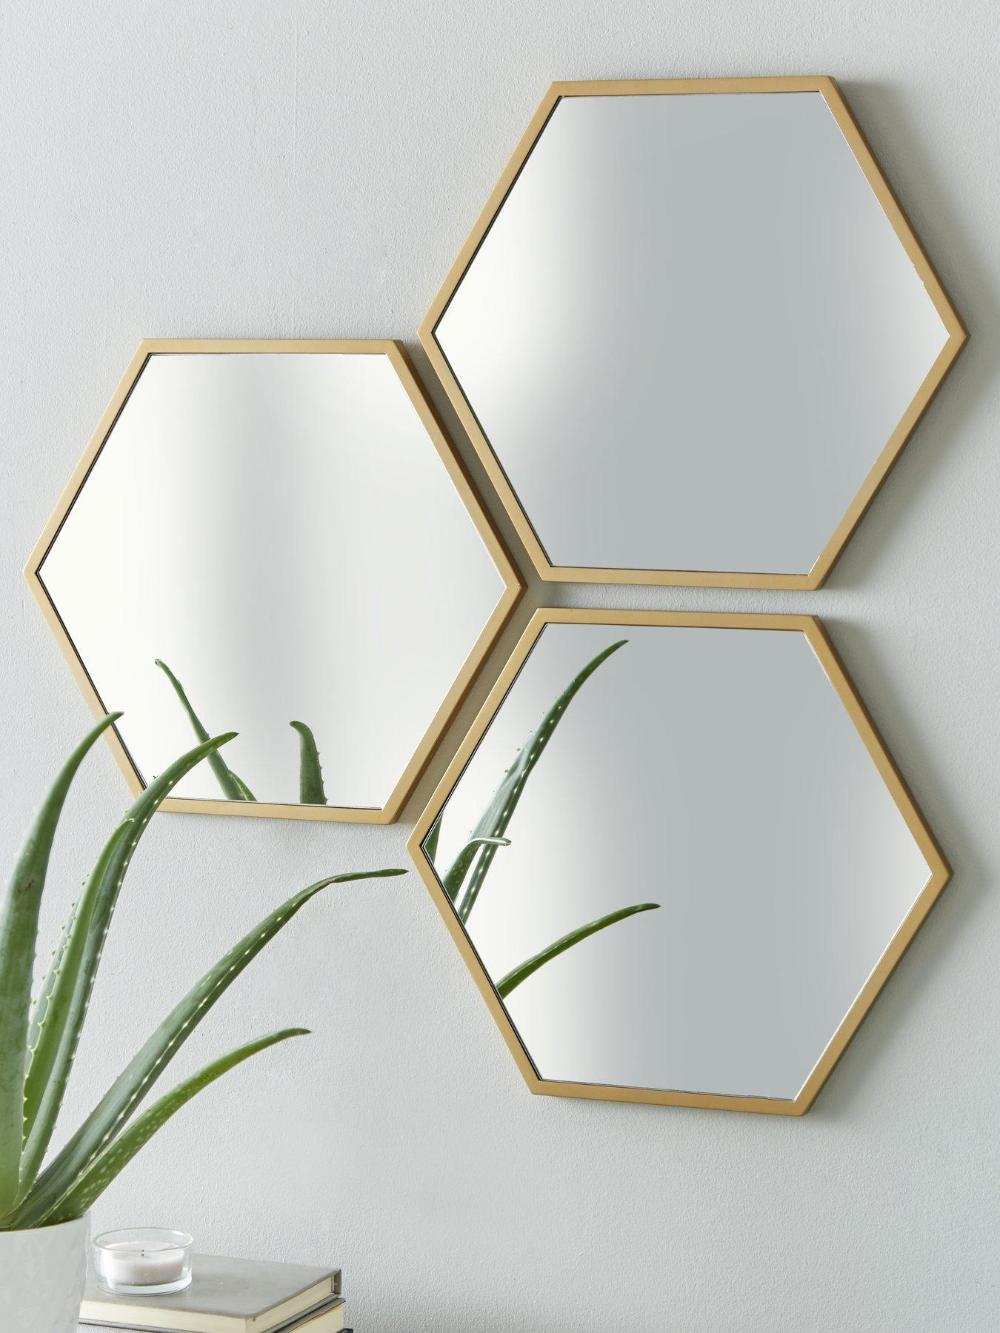 Set Of 3 Gold Hexagon Wall Mirrors Wall Mirror Decor Living Room Gold Mirror Wall Gold Mirror Living Room